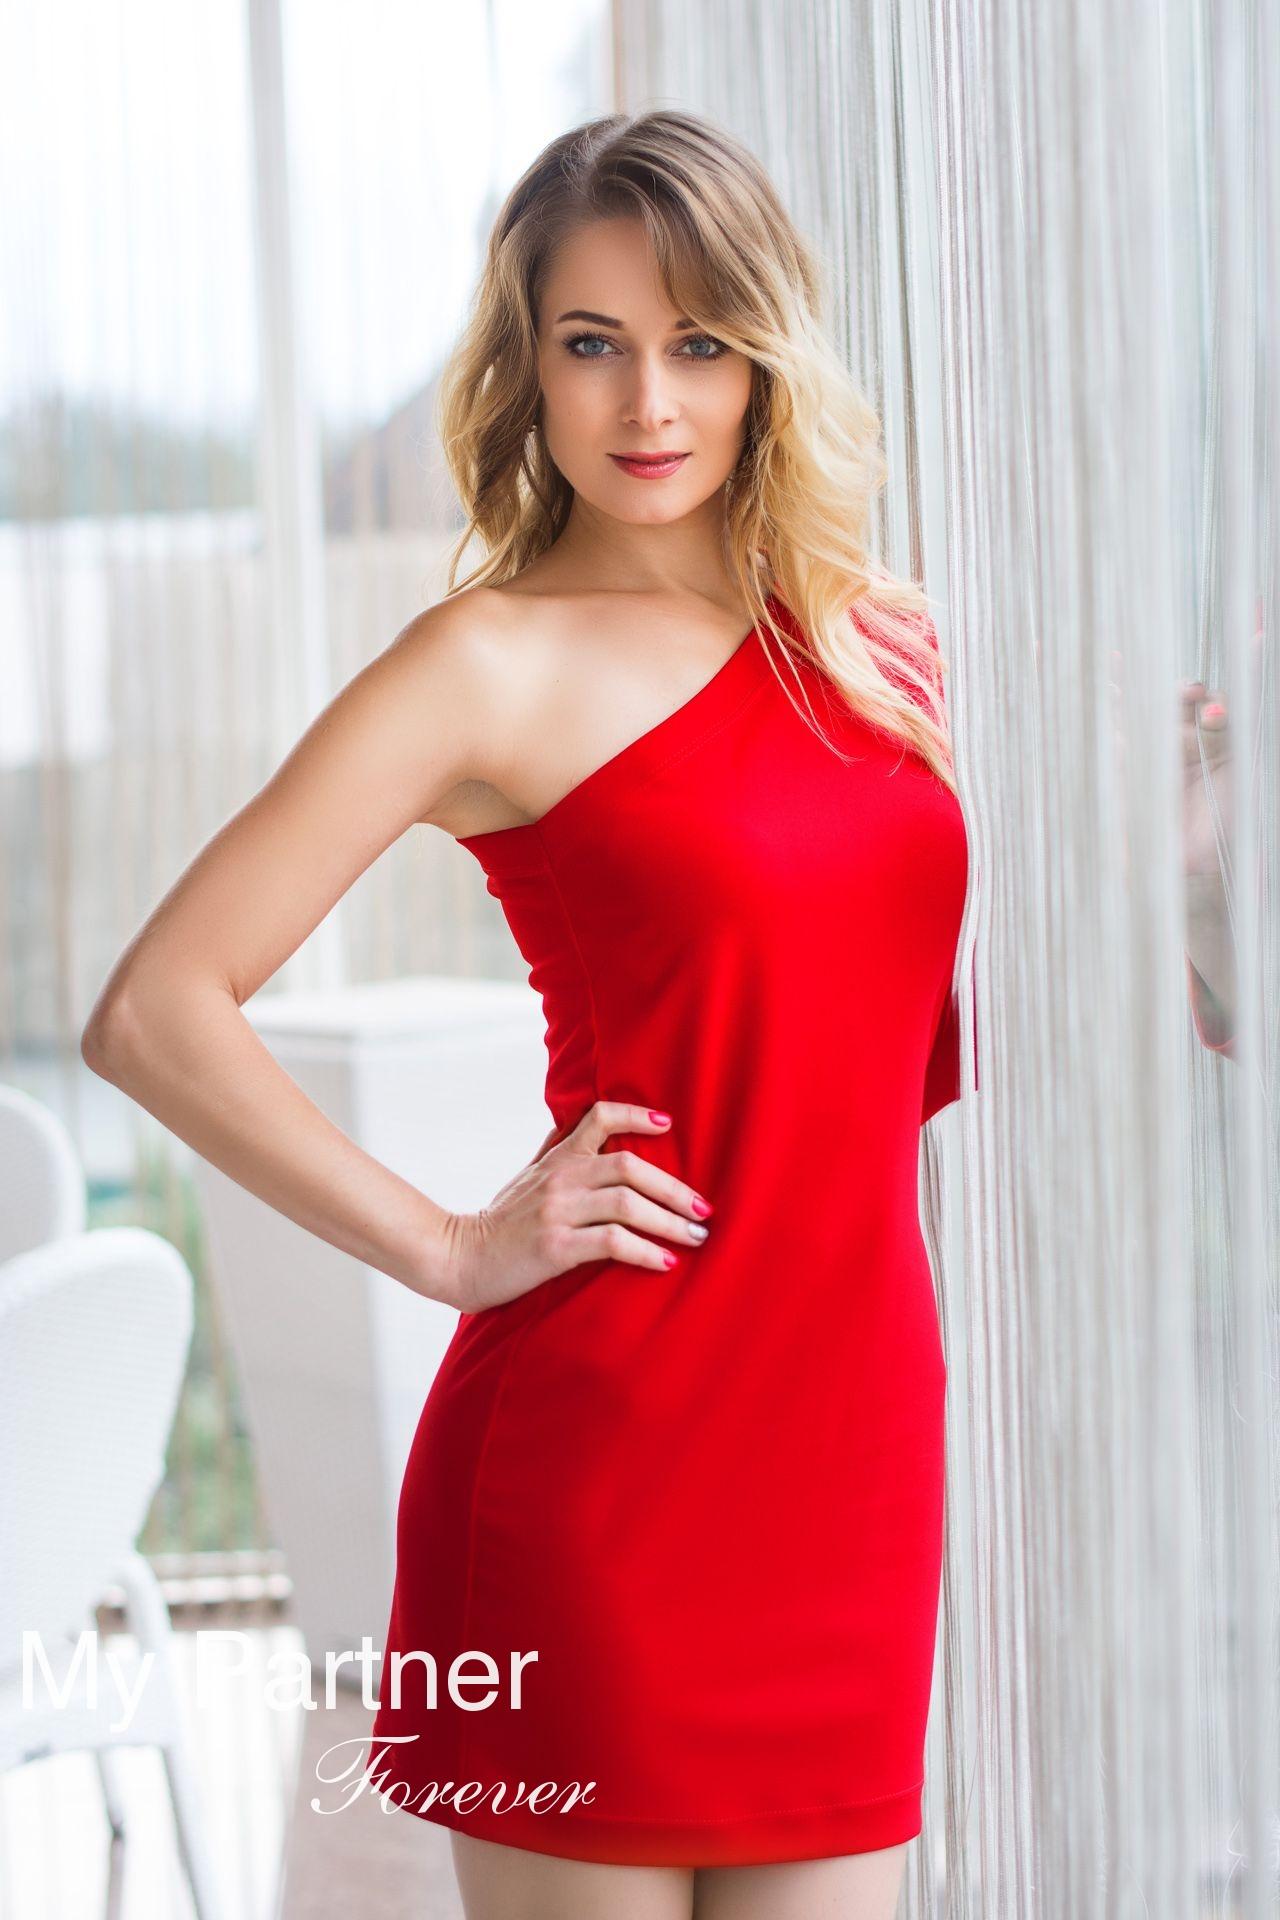 Dating Site to Meet Sexy Ukrainian Girl Elena from Dniepropetrovsk, Ukraine